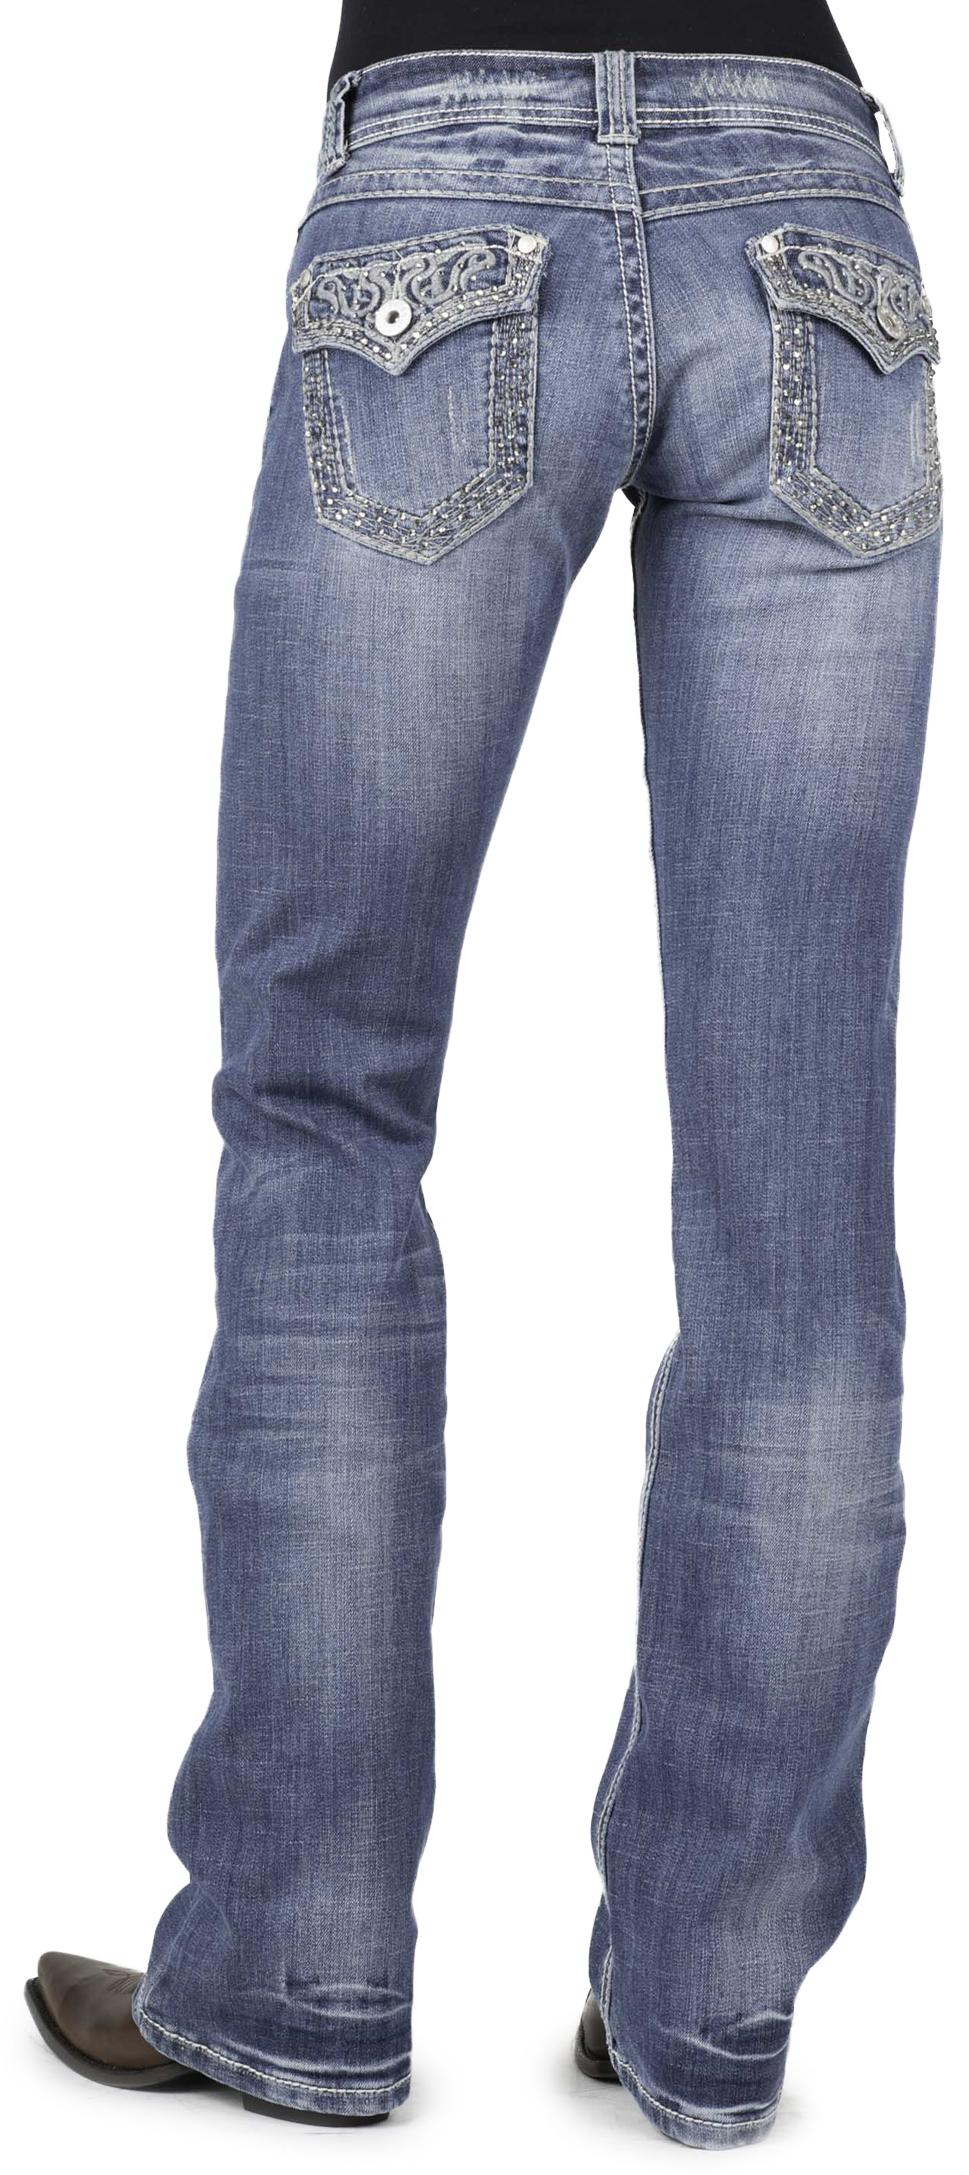 Stetson Jeans Womens